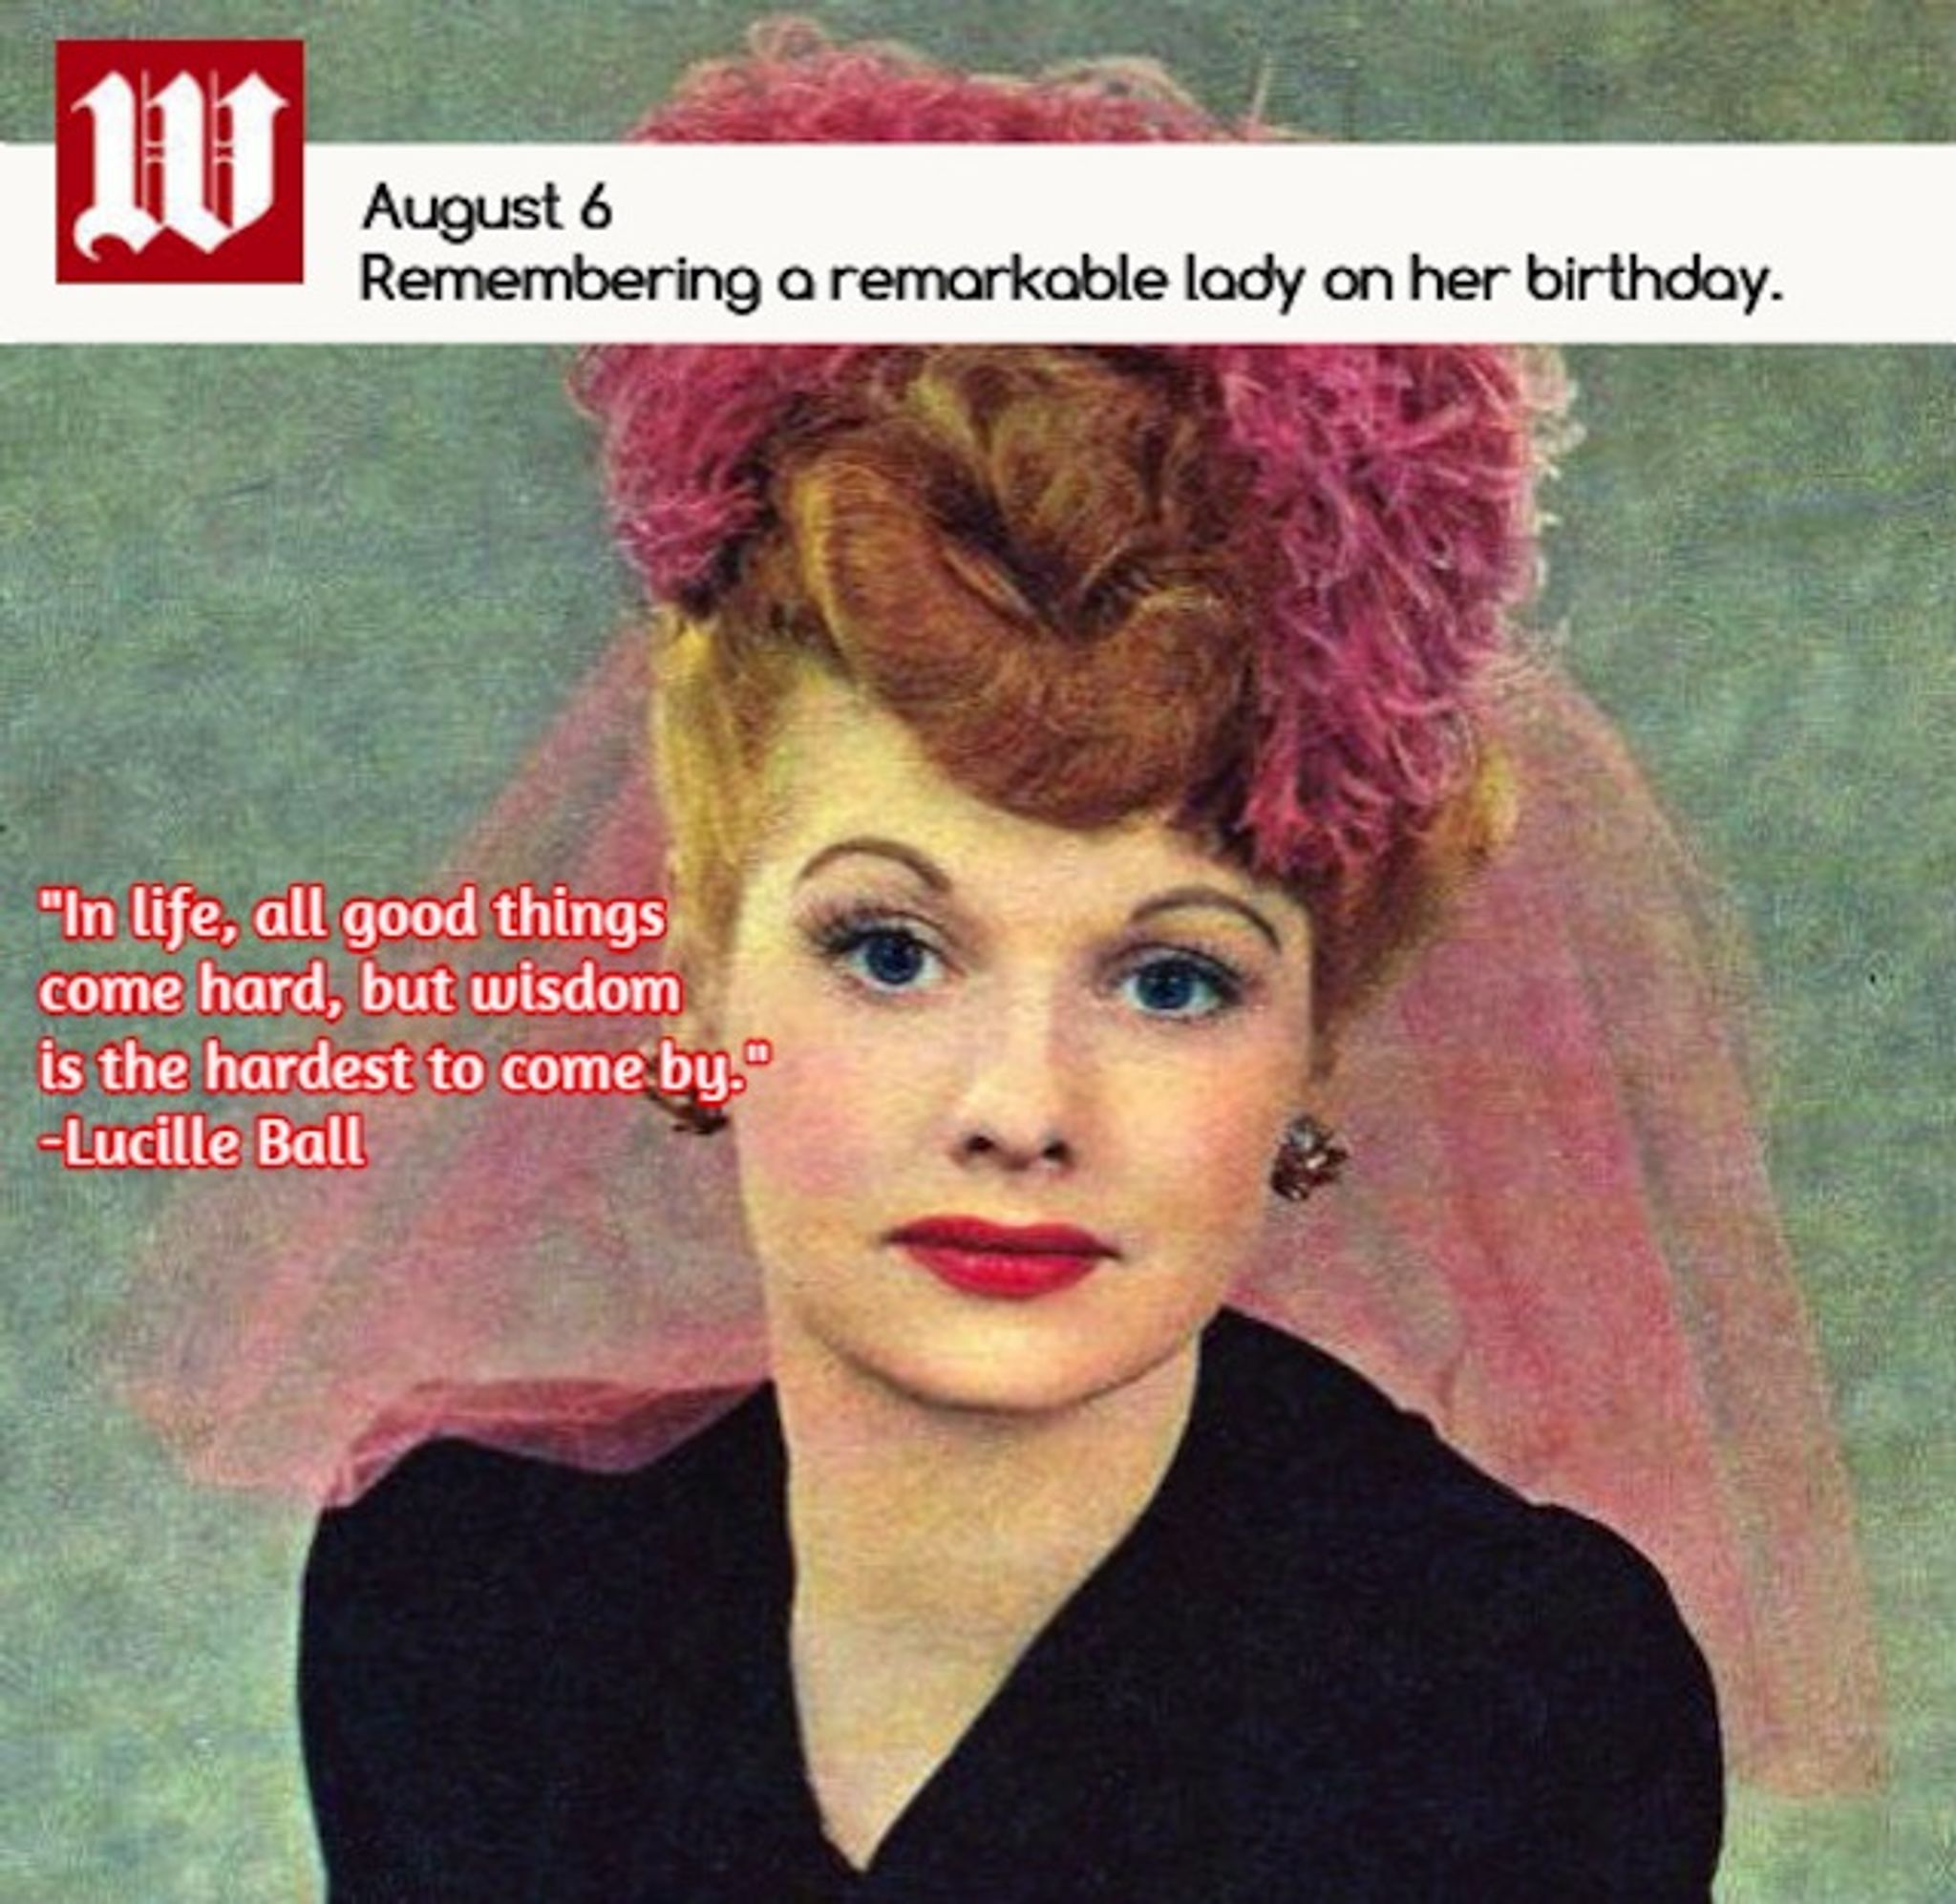 Lucille_Ball_revised_s2048x1994?61c4ebb225f69063faa8152d3a3a47cdea584008 w scott lamb happy birthday lucille ball washington times